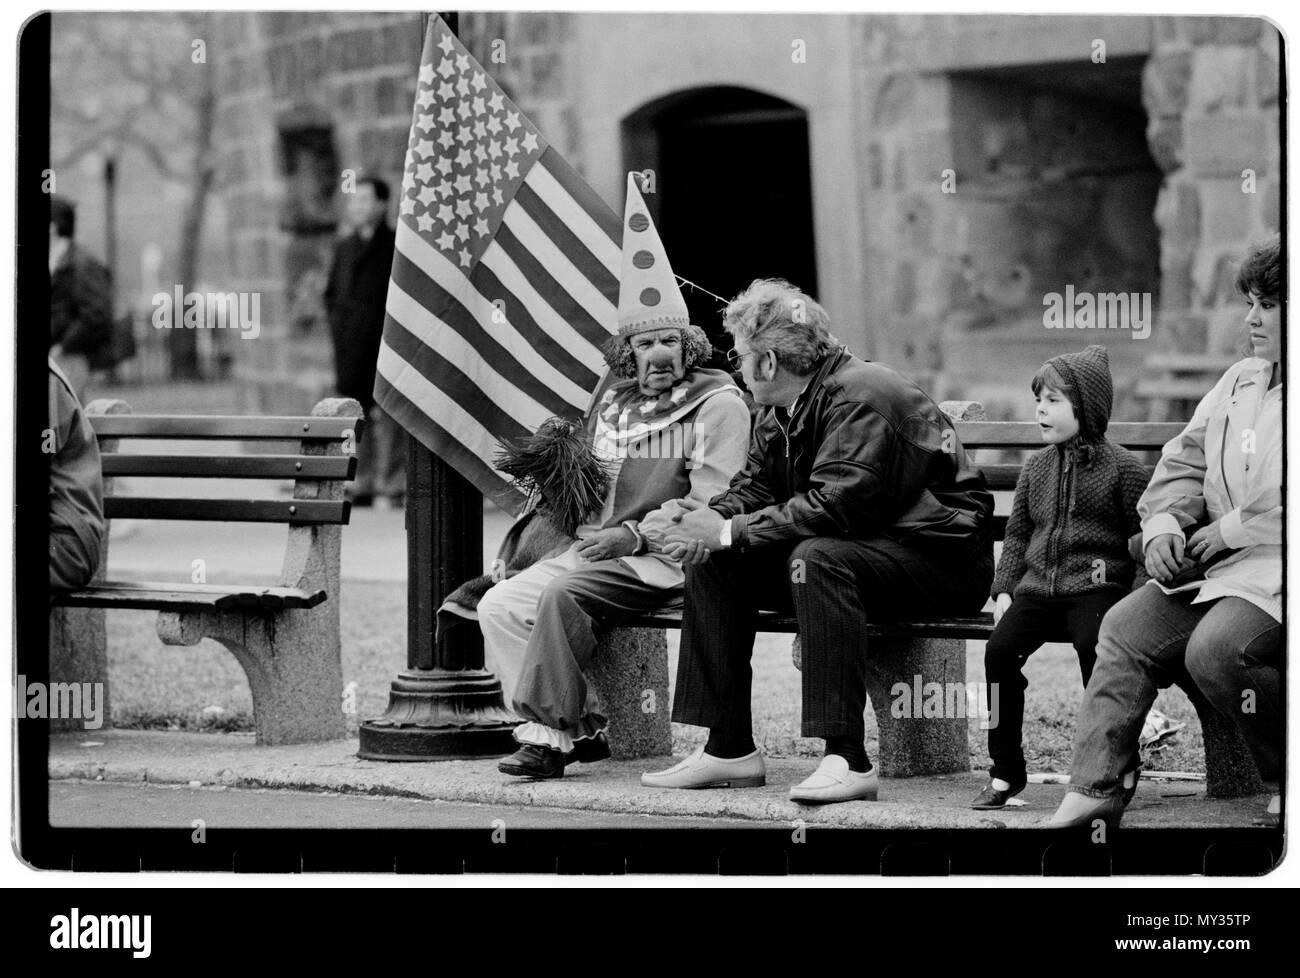 New York City USA 1988 Clown man at Battery Park, Manhattan on a cold Sunday morning. - Stock Image